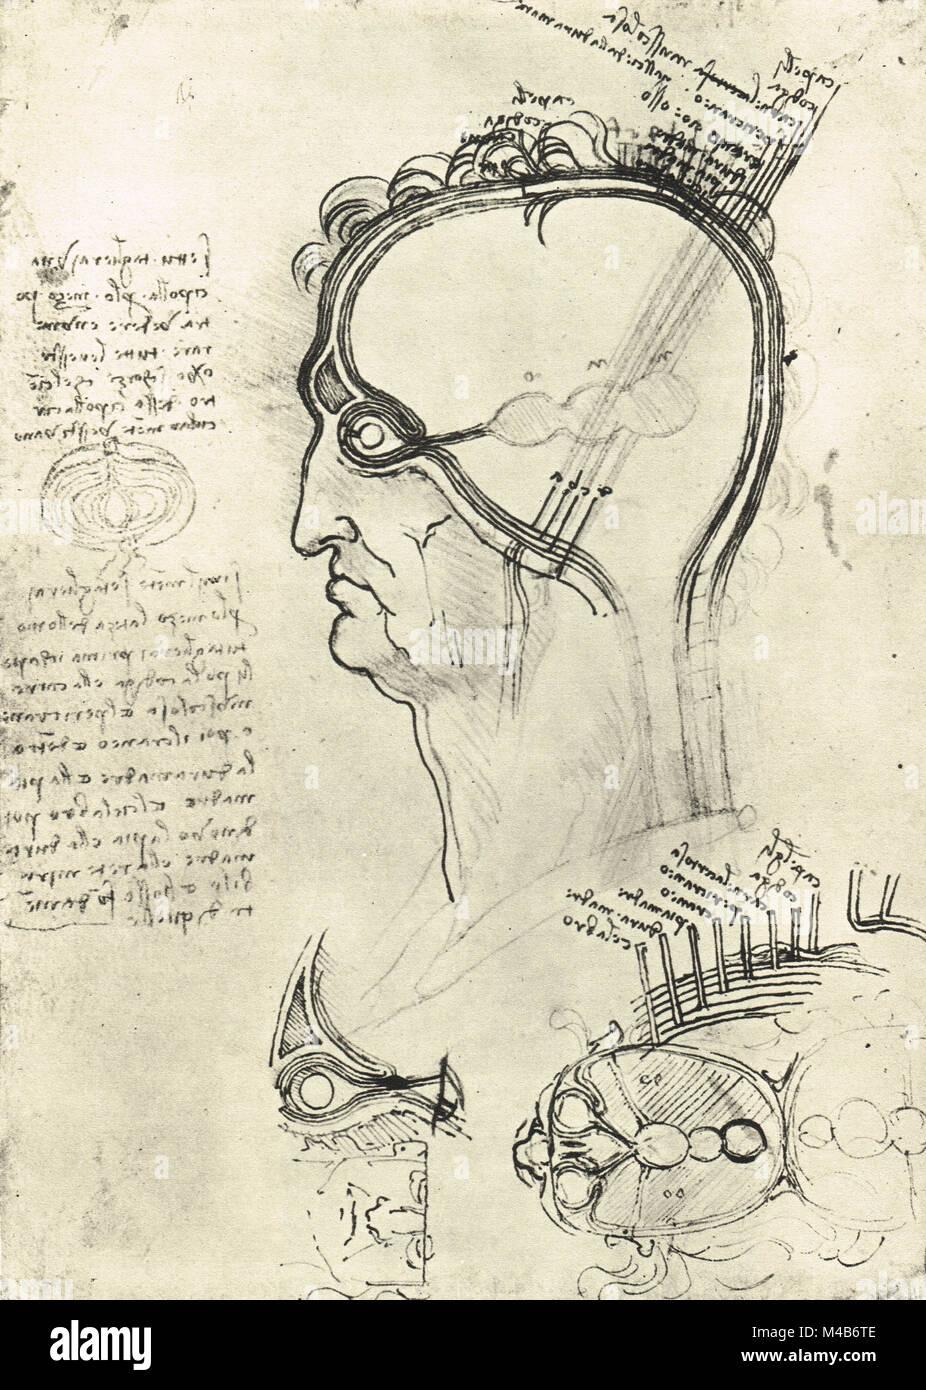 Sections of a Man's head, showing the anatomy of the eye, drawn by Leonardo Da Vinci, circa 1500 - Stock Image